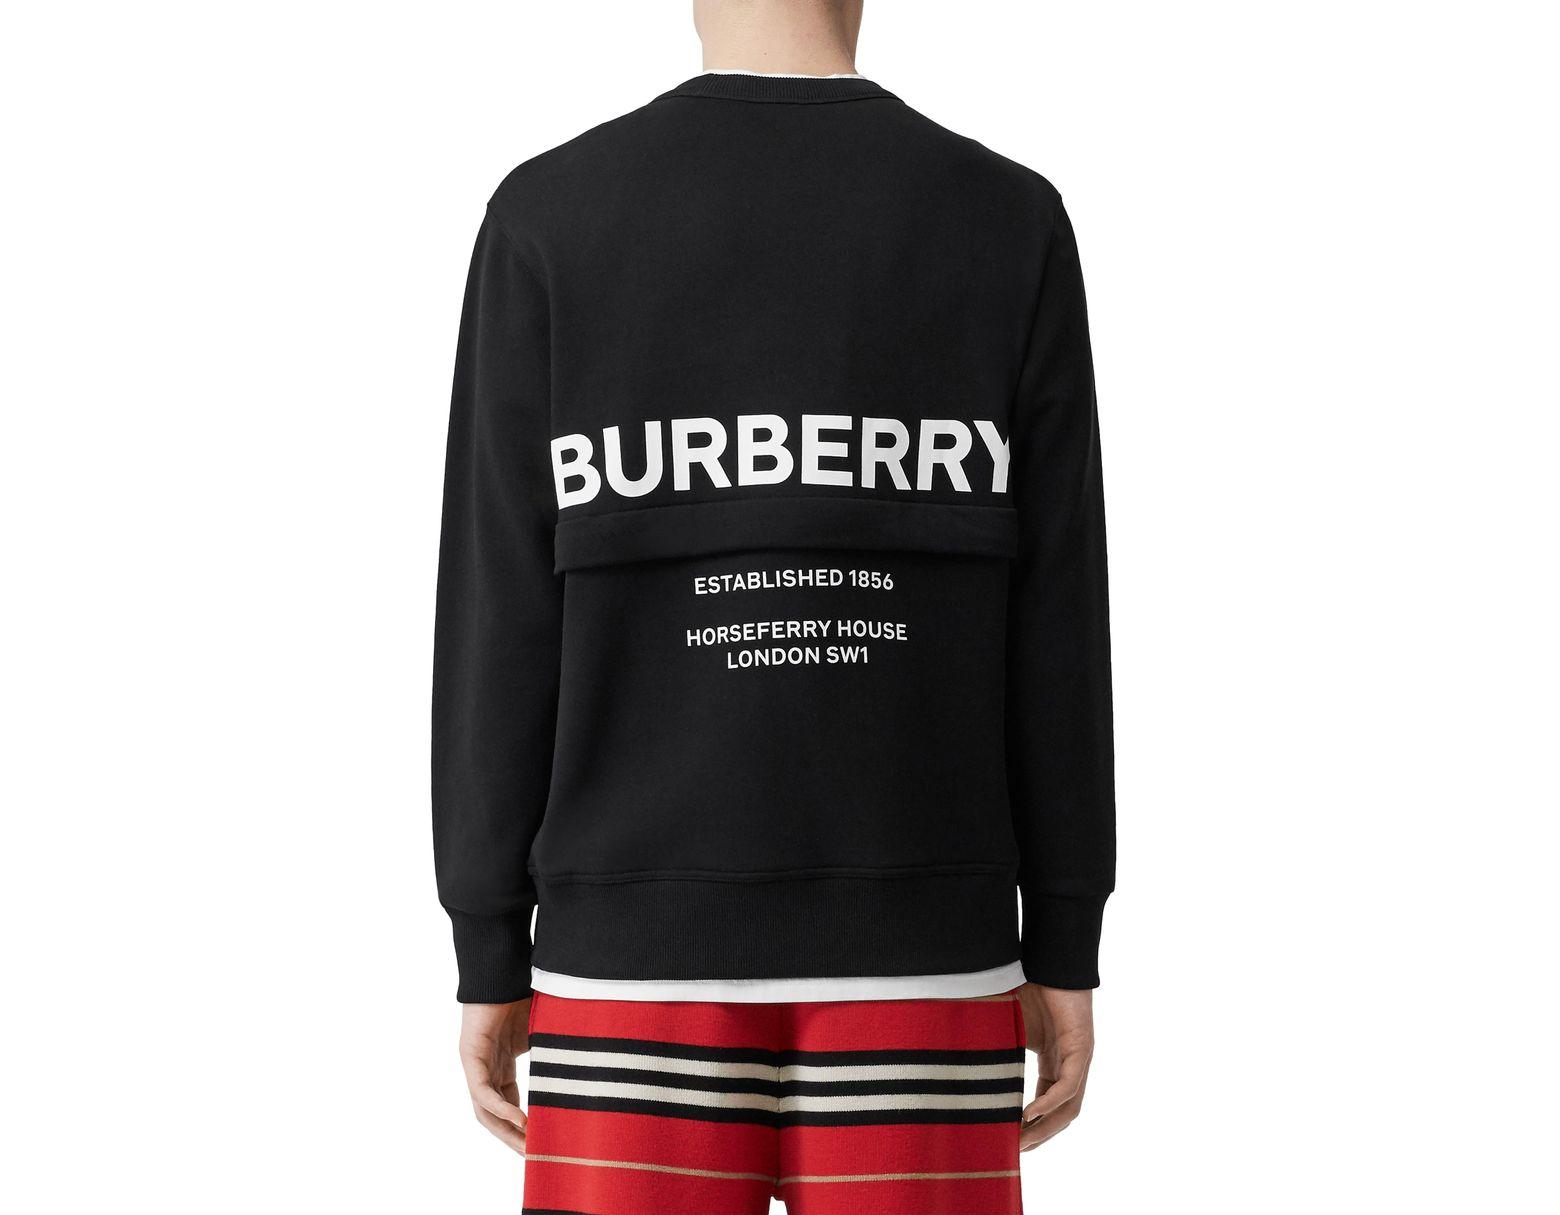 81c3eb7870b Burberry Acklow Horseferry Print Zip Pocket Sweatshirt in Black for Men -  Lyst